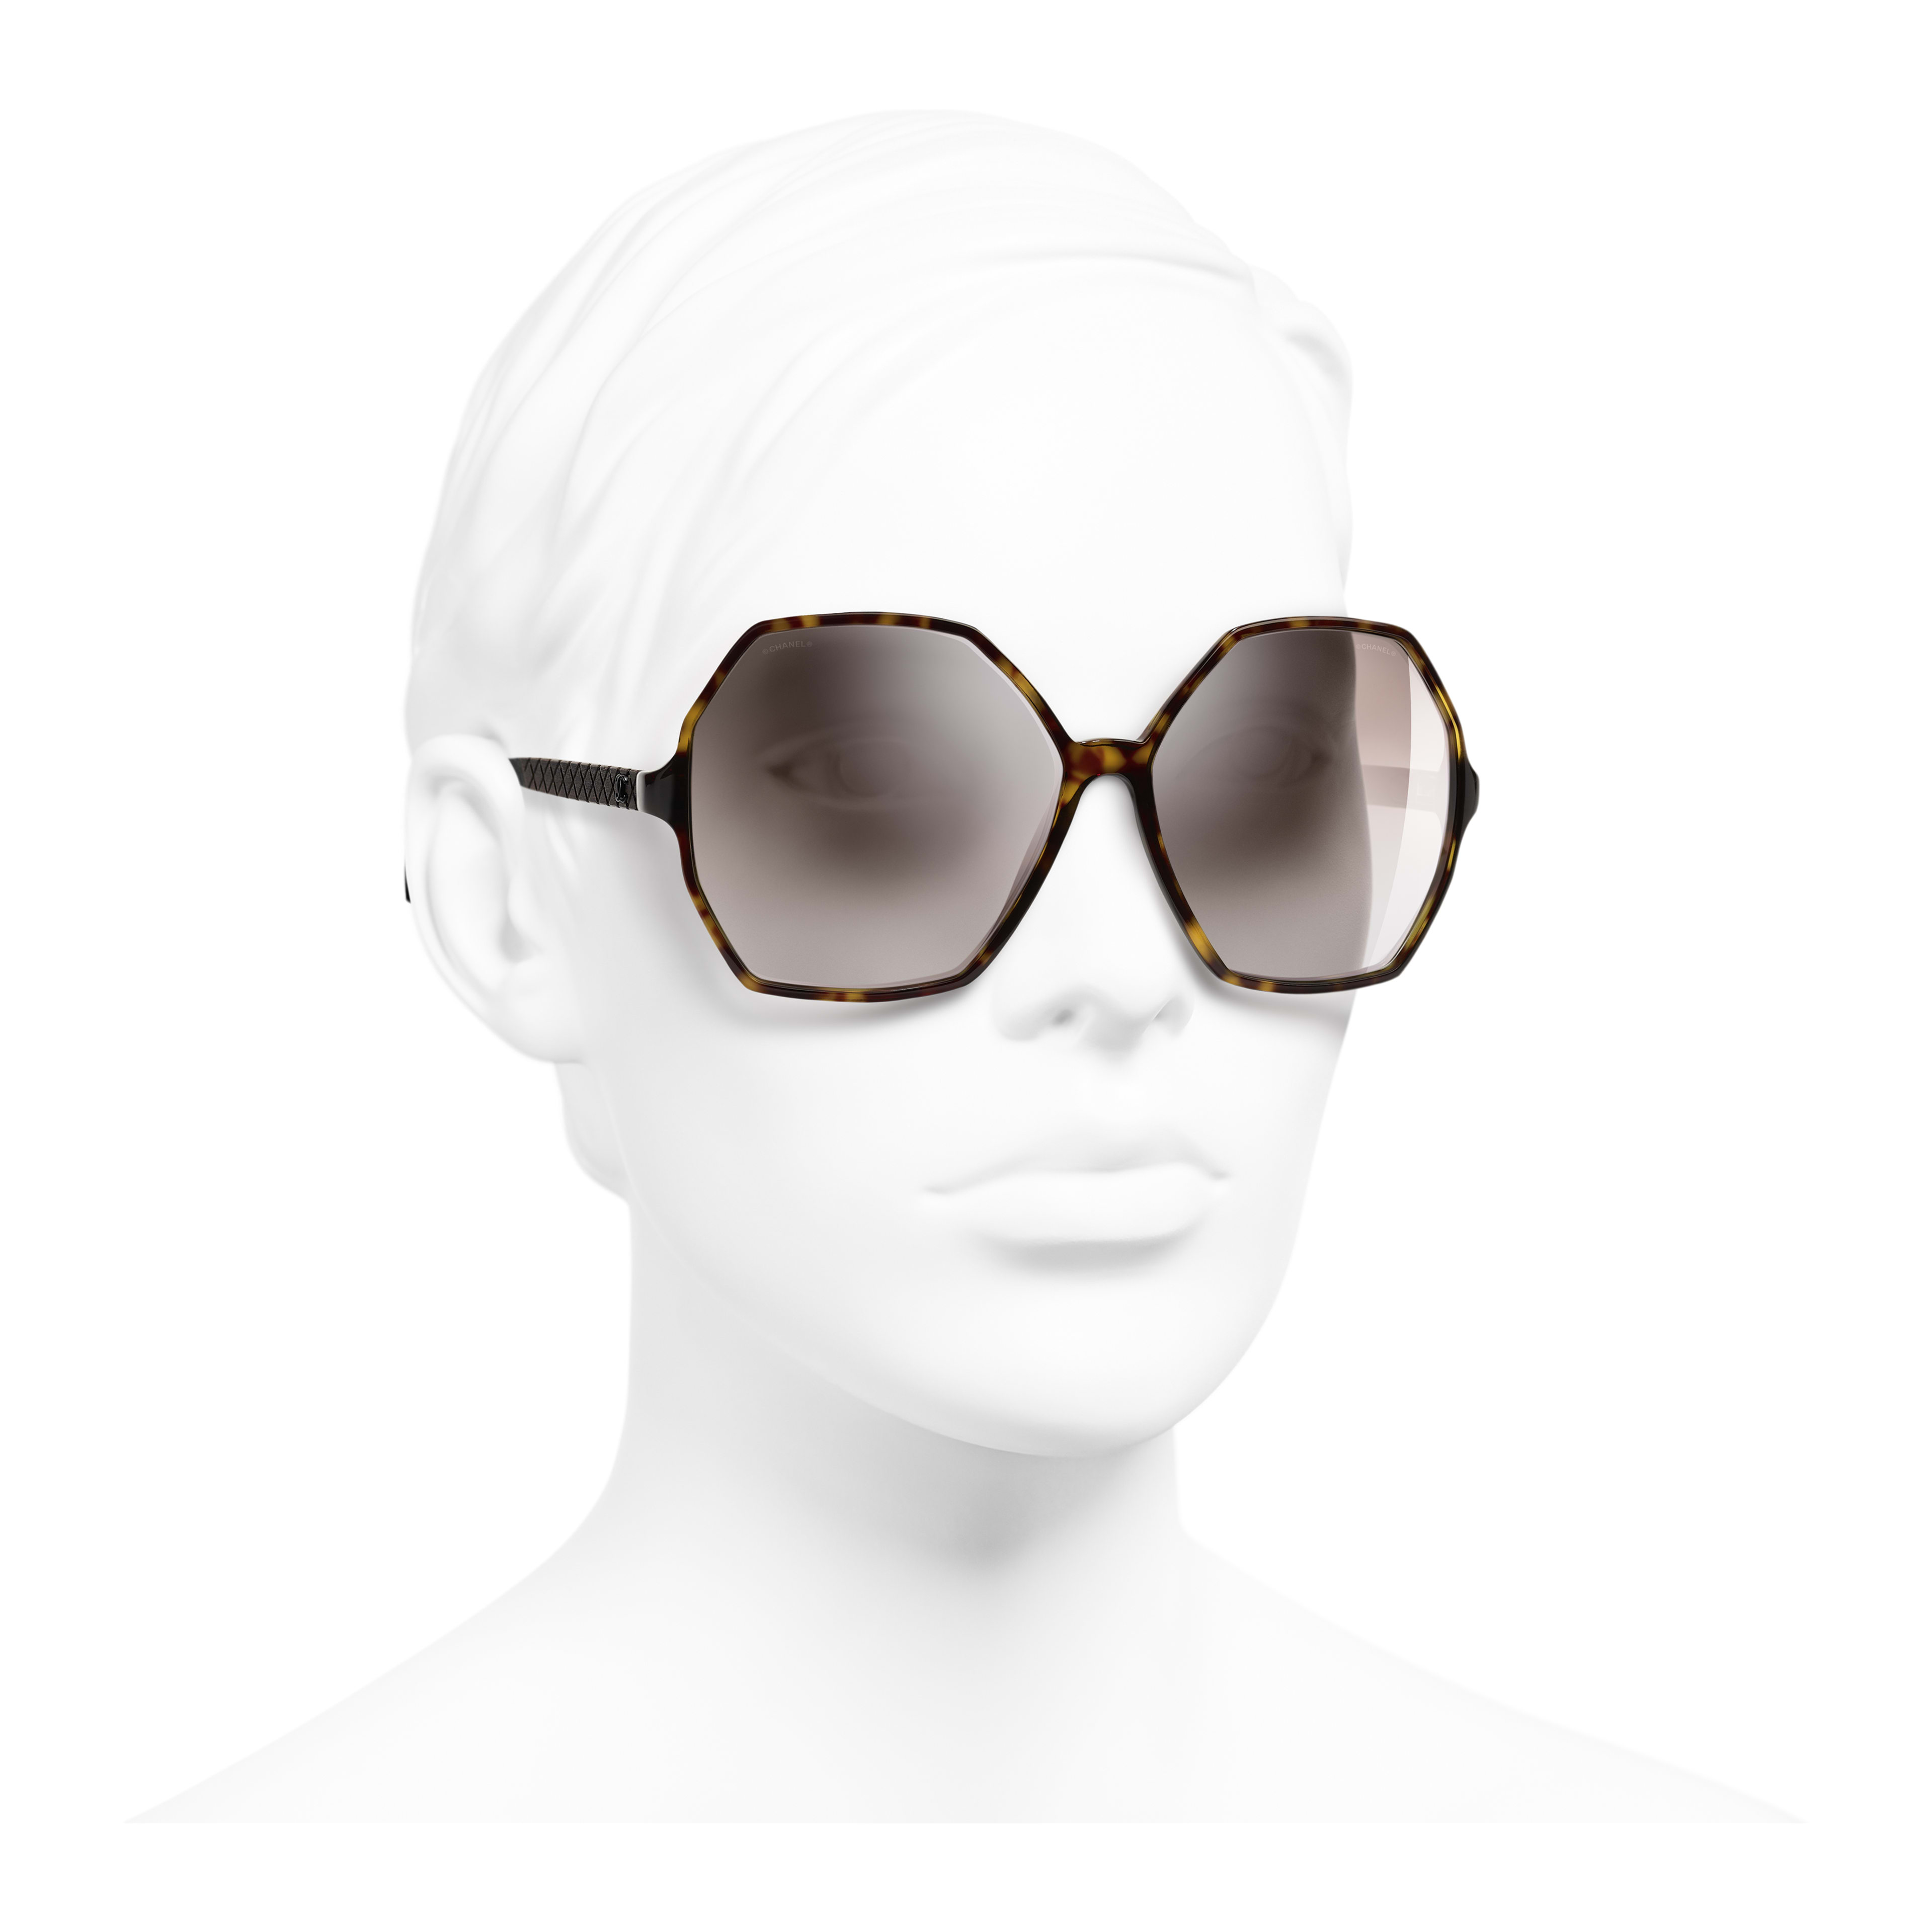 Round Sunglasses - Dark Tortoise - Acetate, Wood & Rubber - Worn 3/4 view - see full sized version